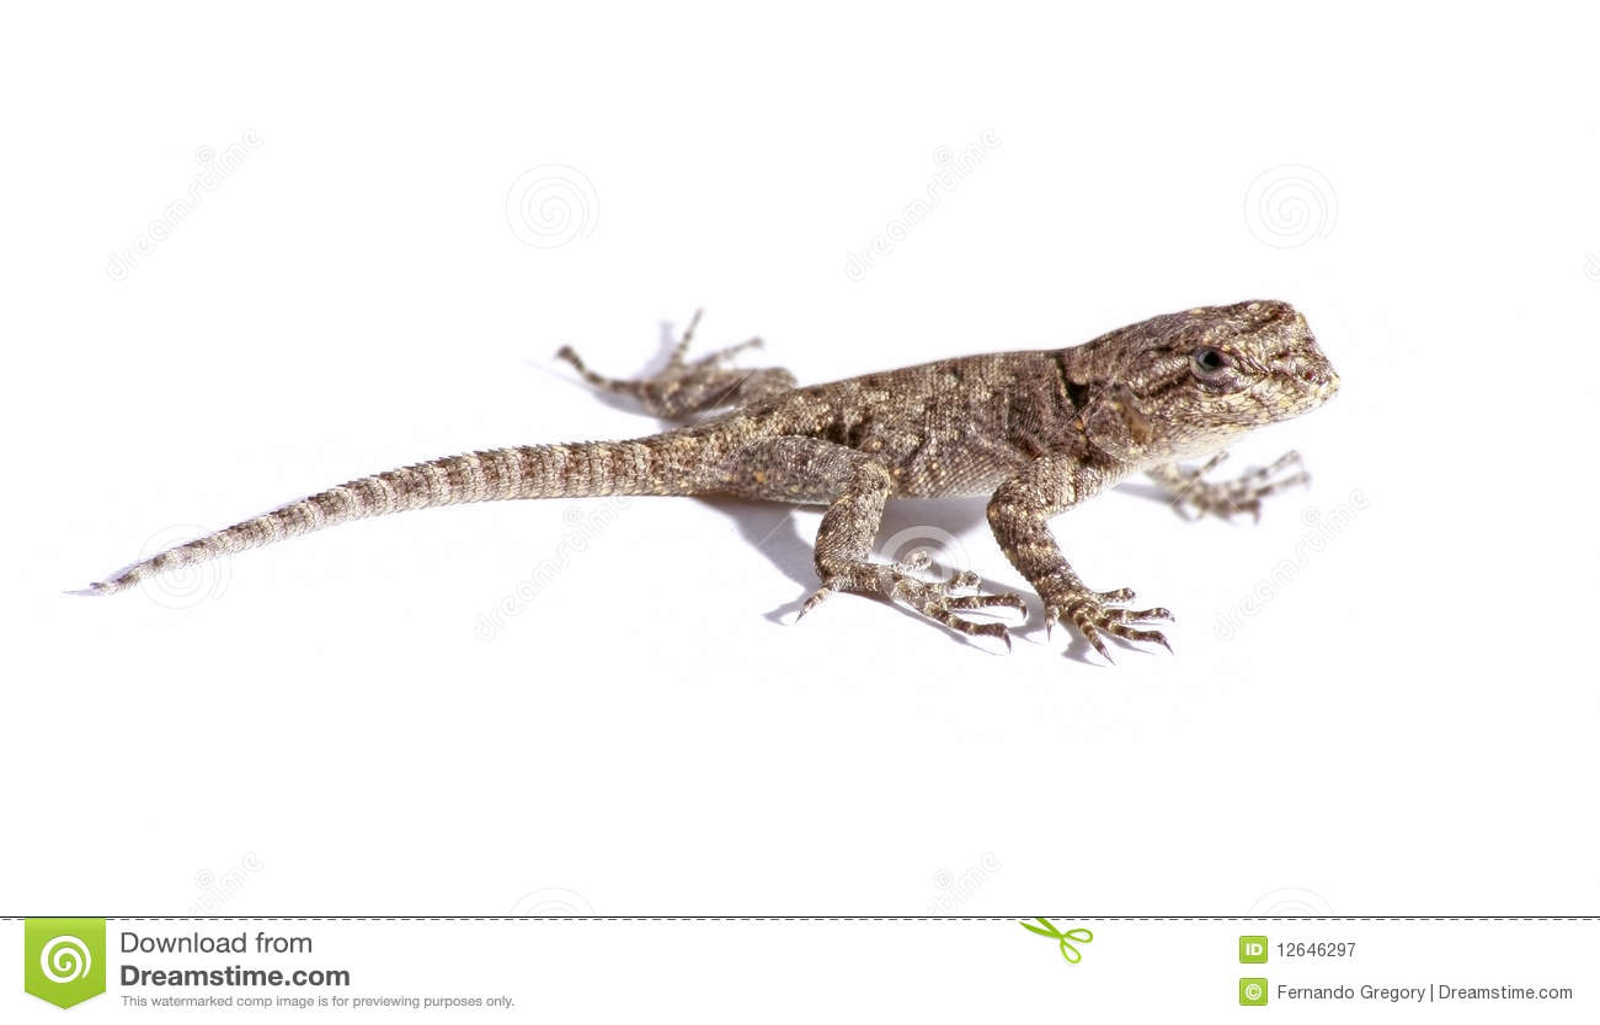 common garden lizard isolated on white - Garden Lizard